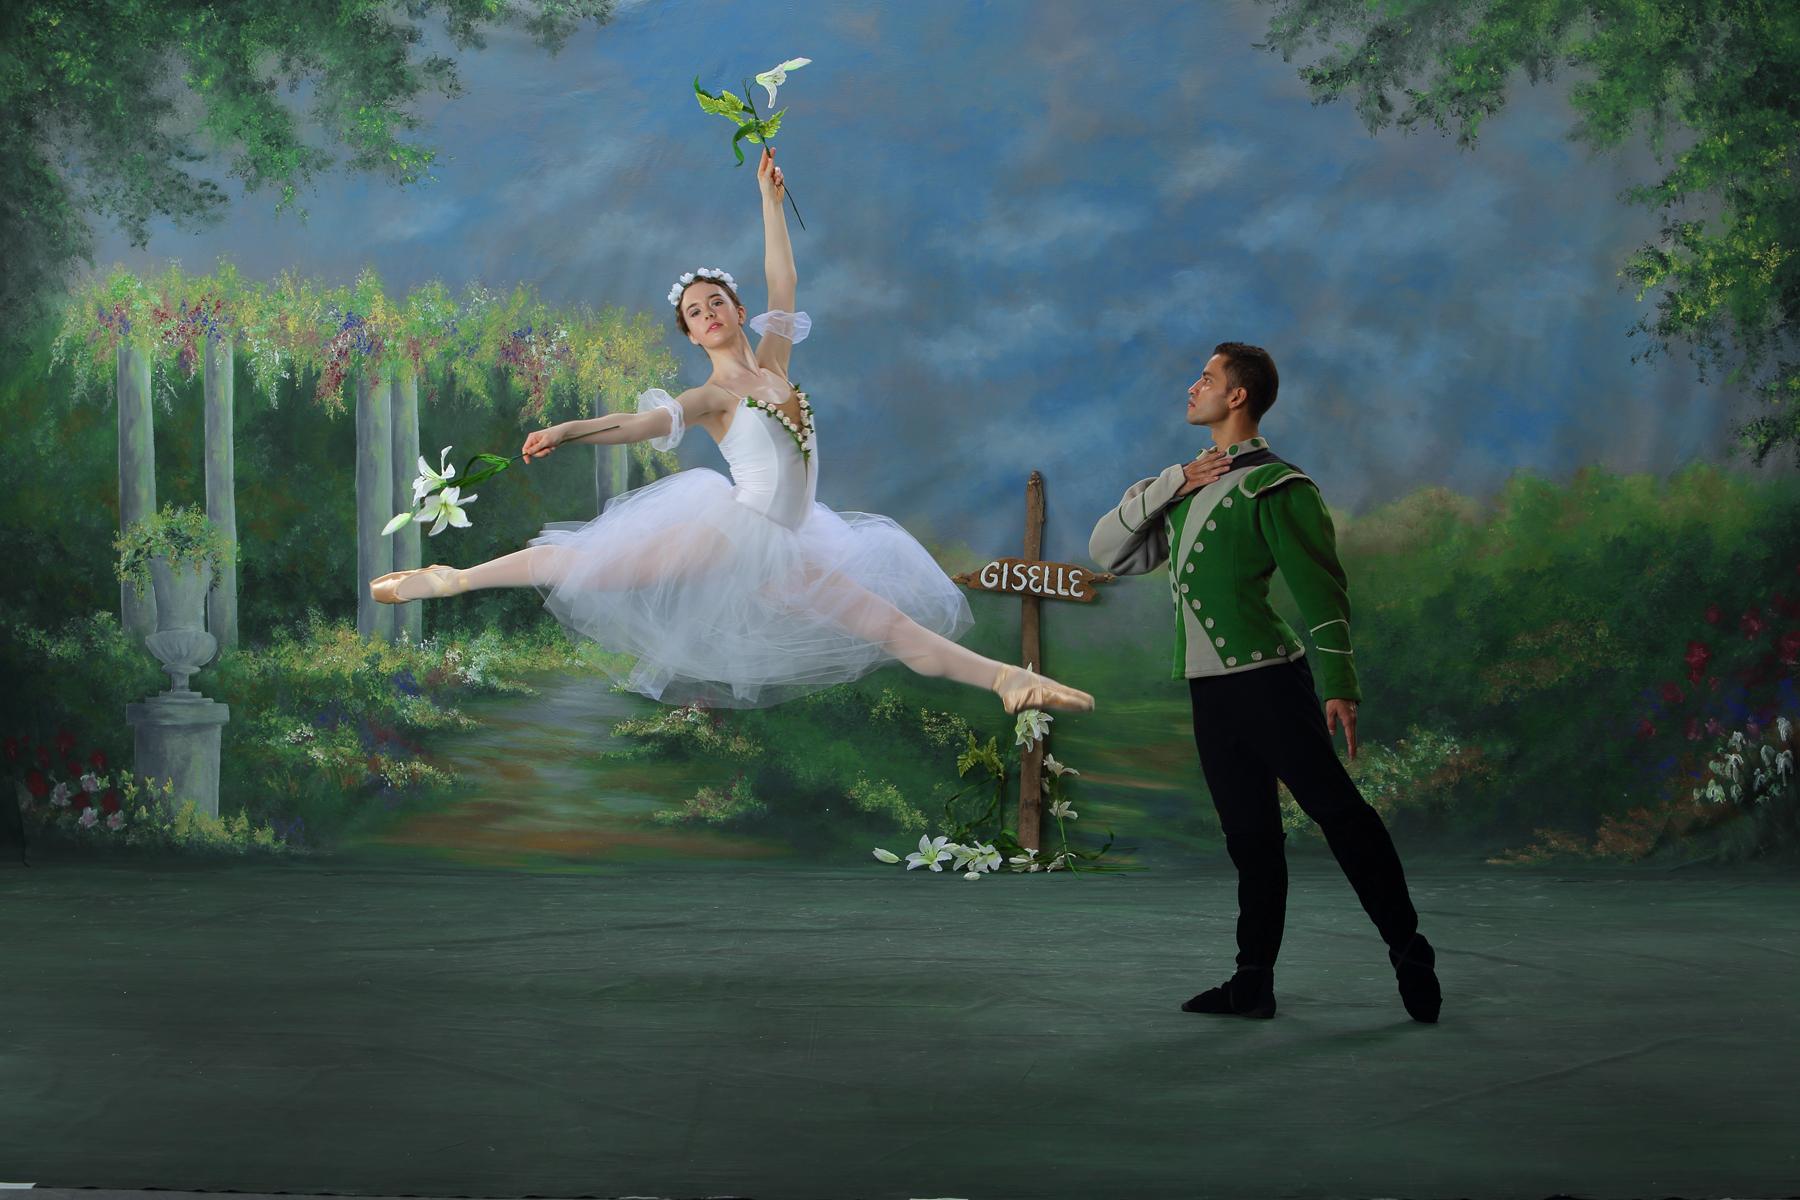 Giselle Spring Performance